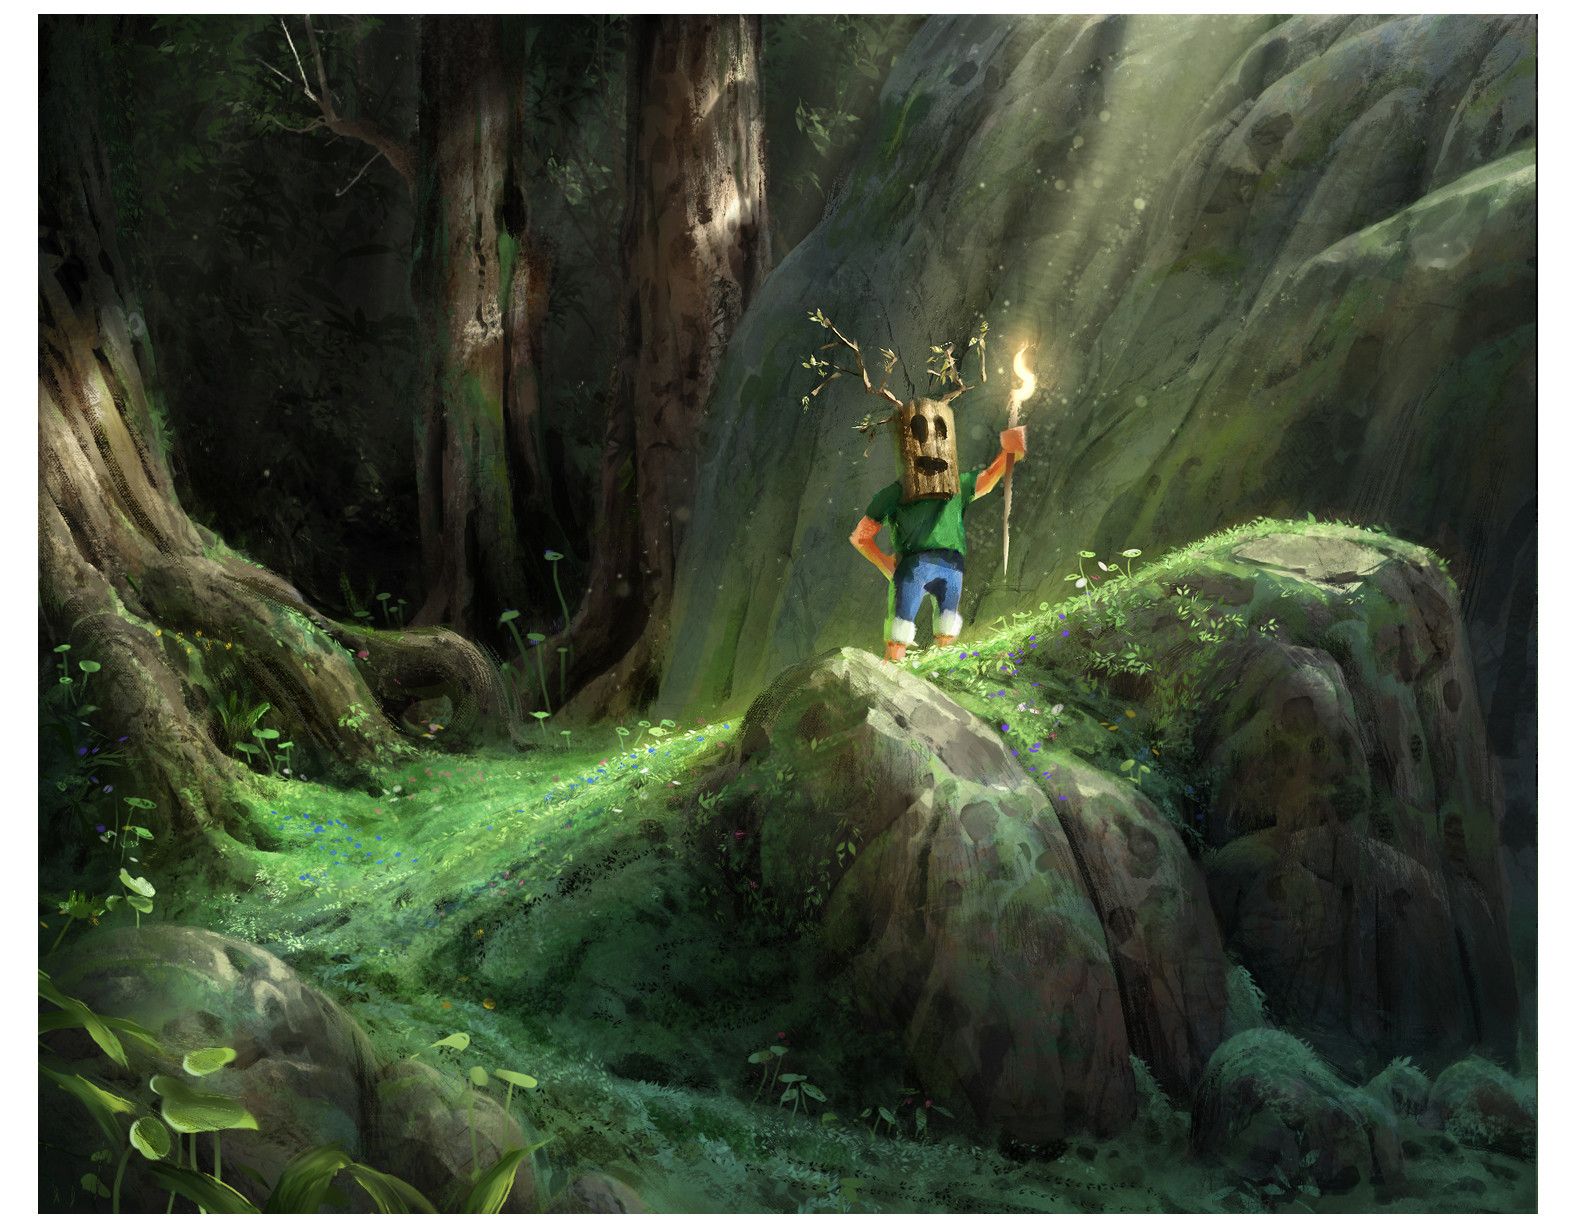 Quentin mabille forest spirit v1